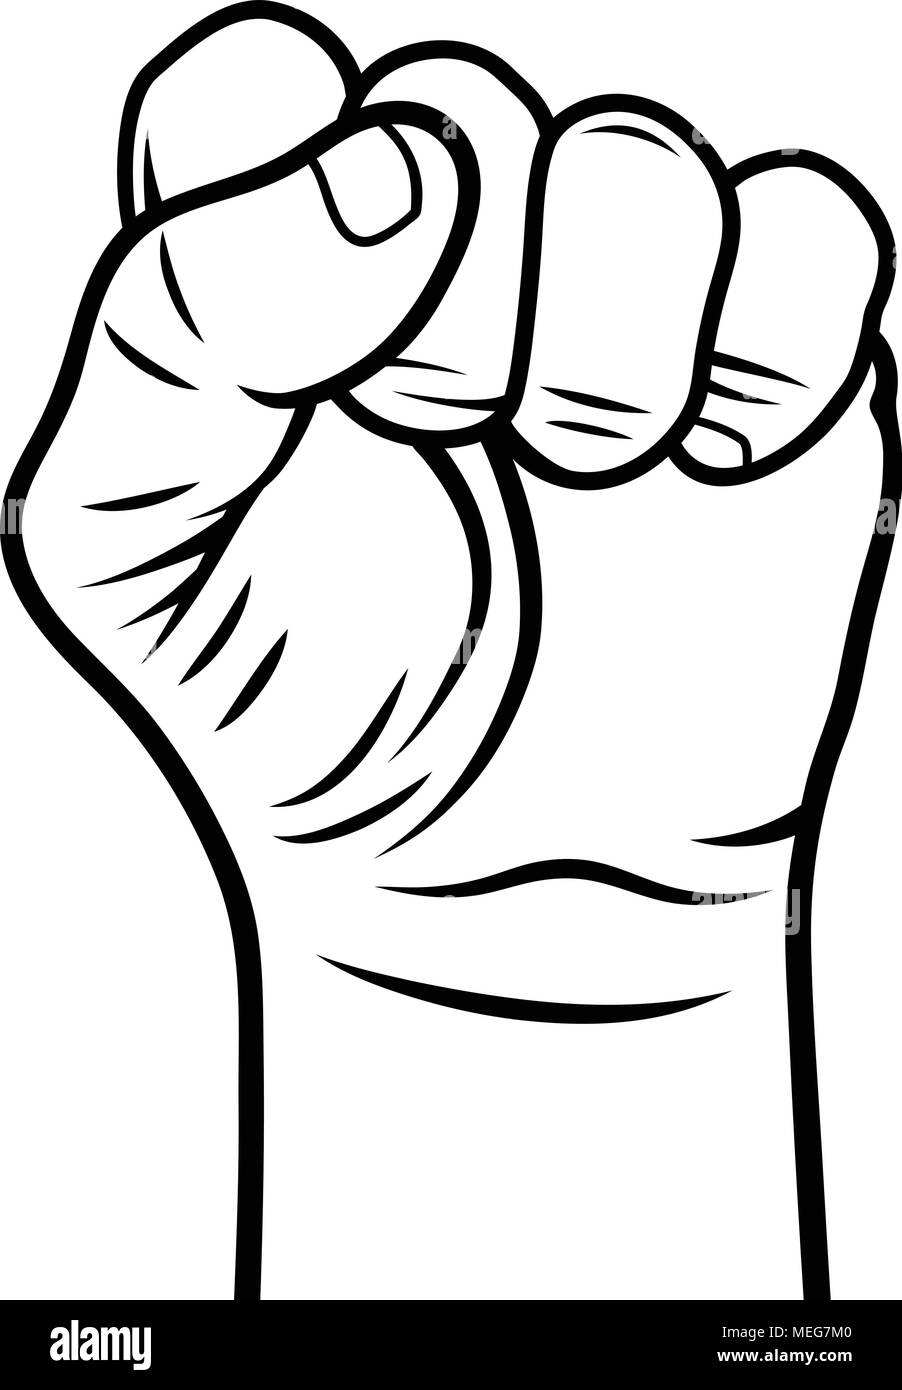 Male fist vector illustration fist held in protest revolt symbol stock image